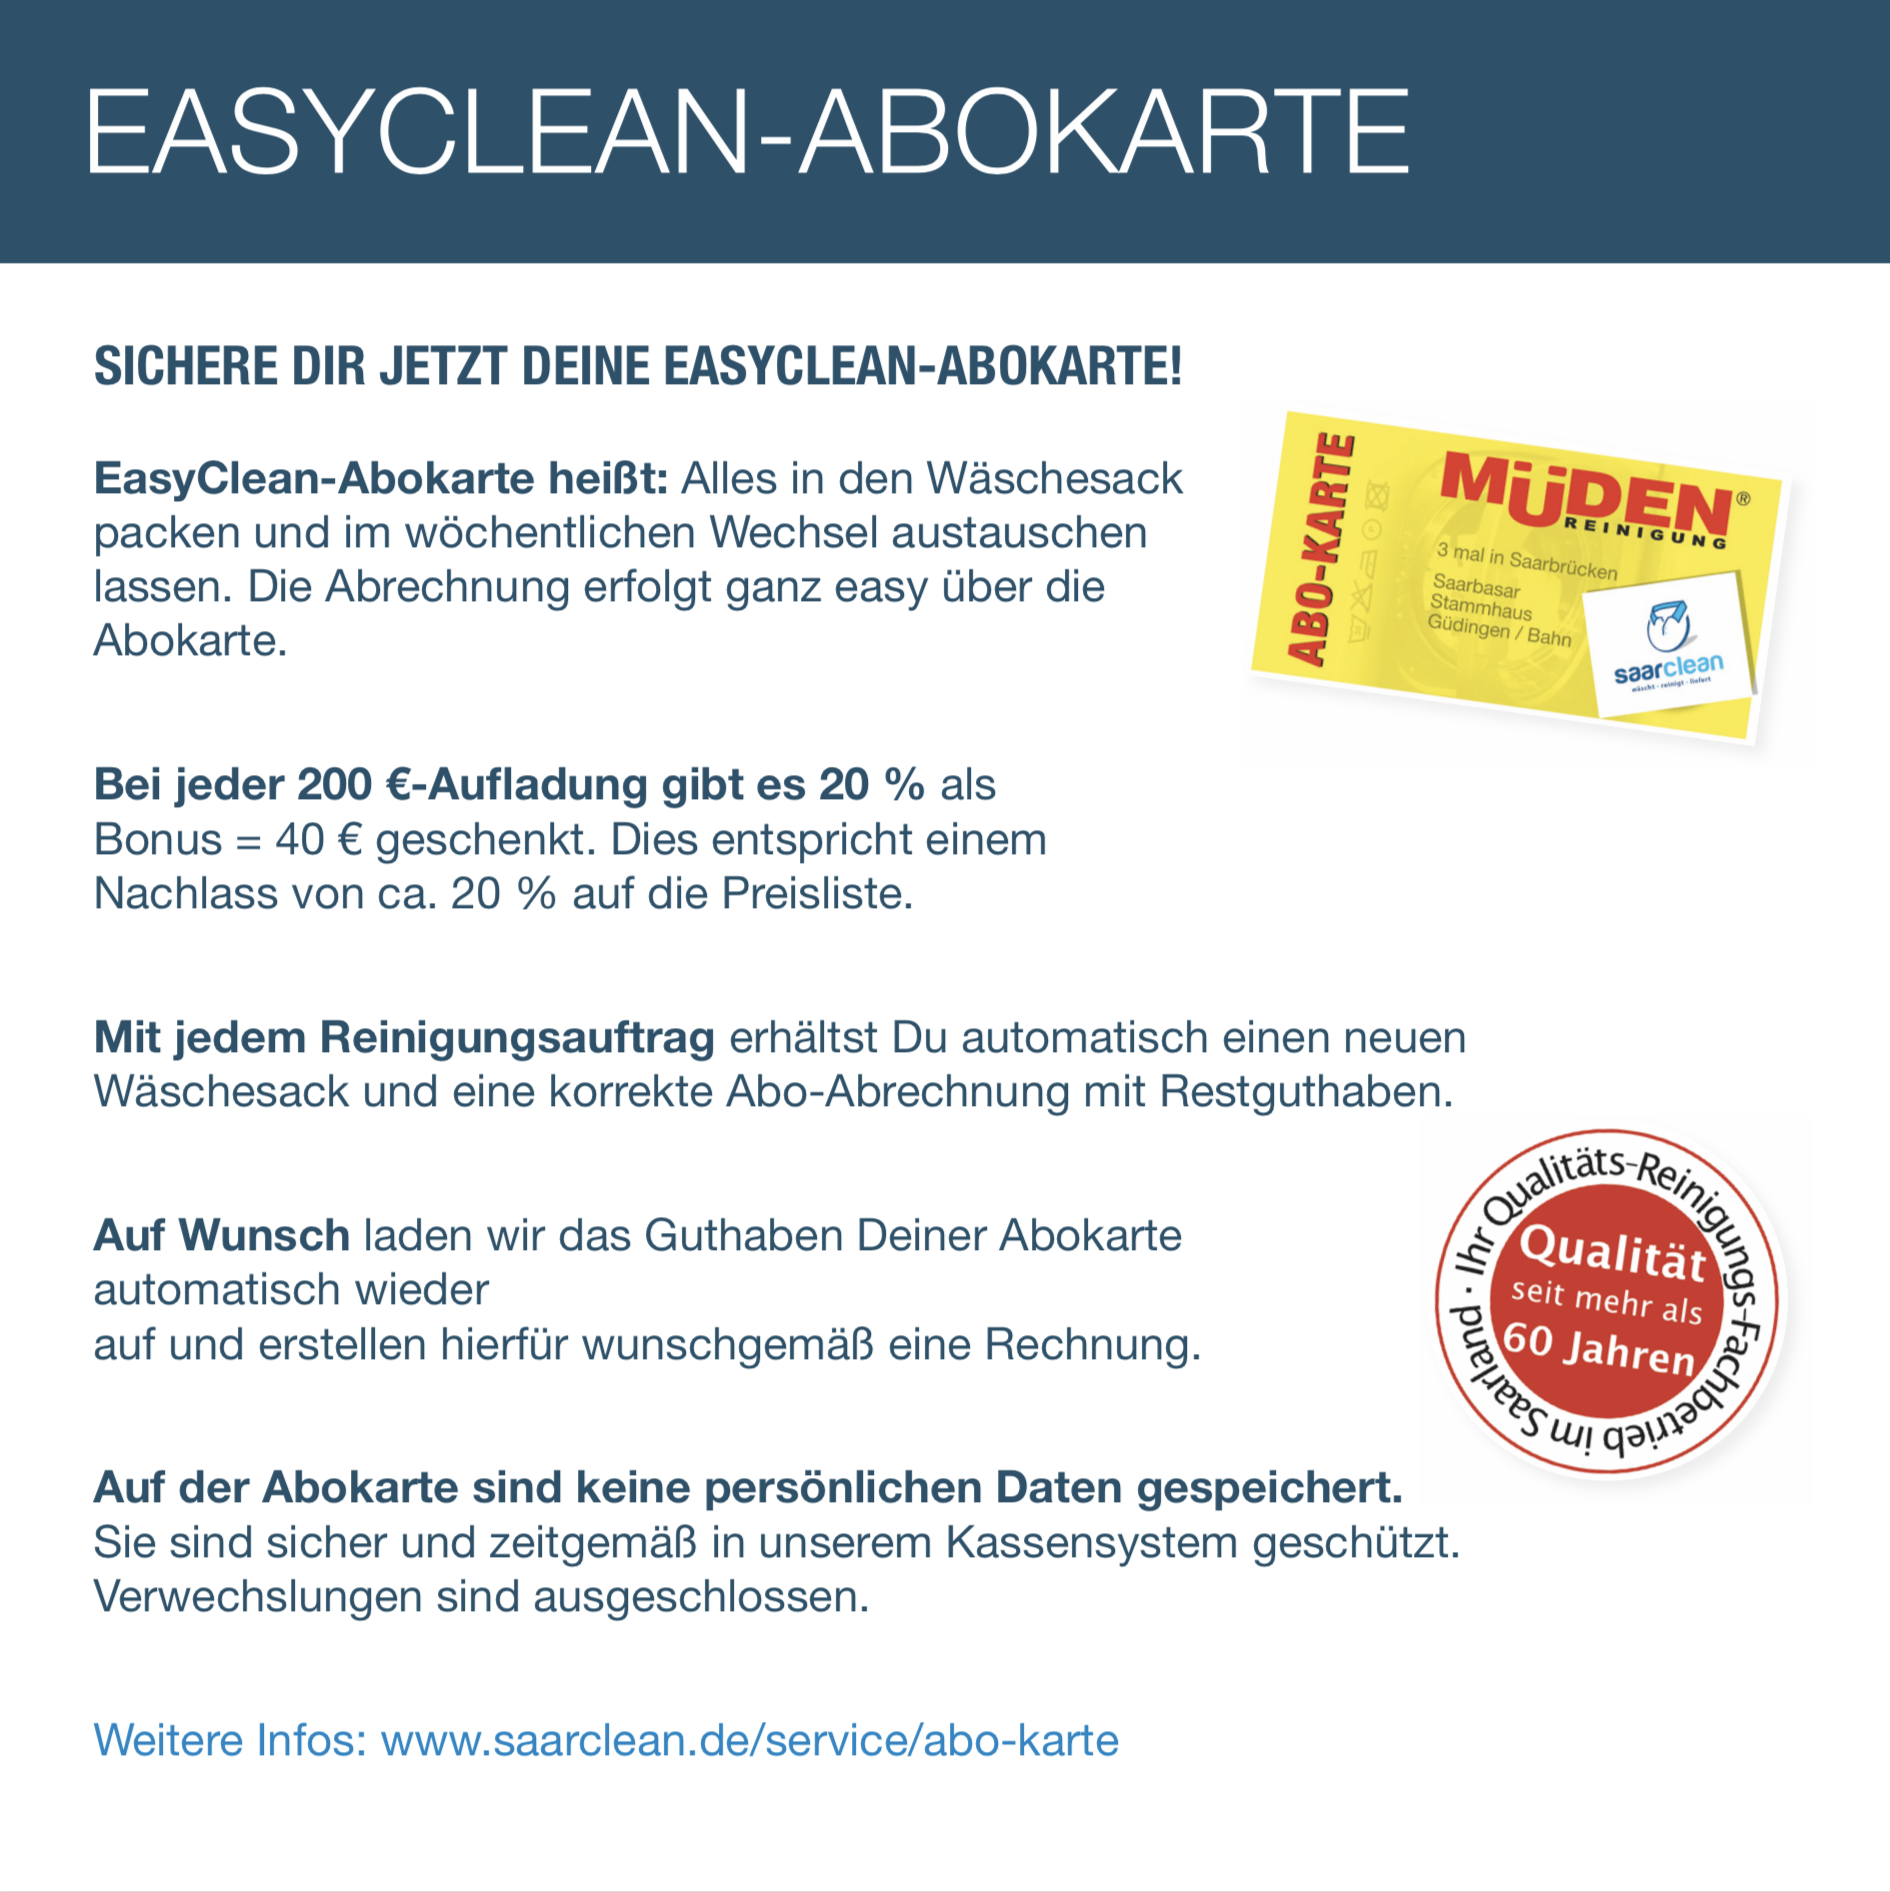 saarclean Lieferservice - Wir schenken dir Zeit # 3 EasyClean Abokarte